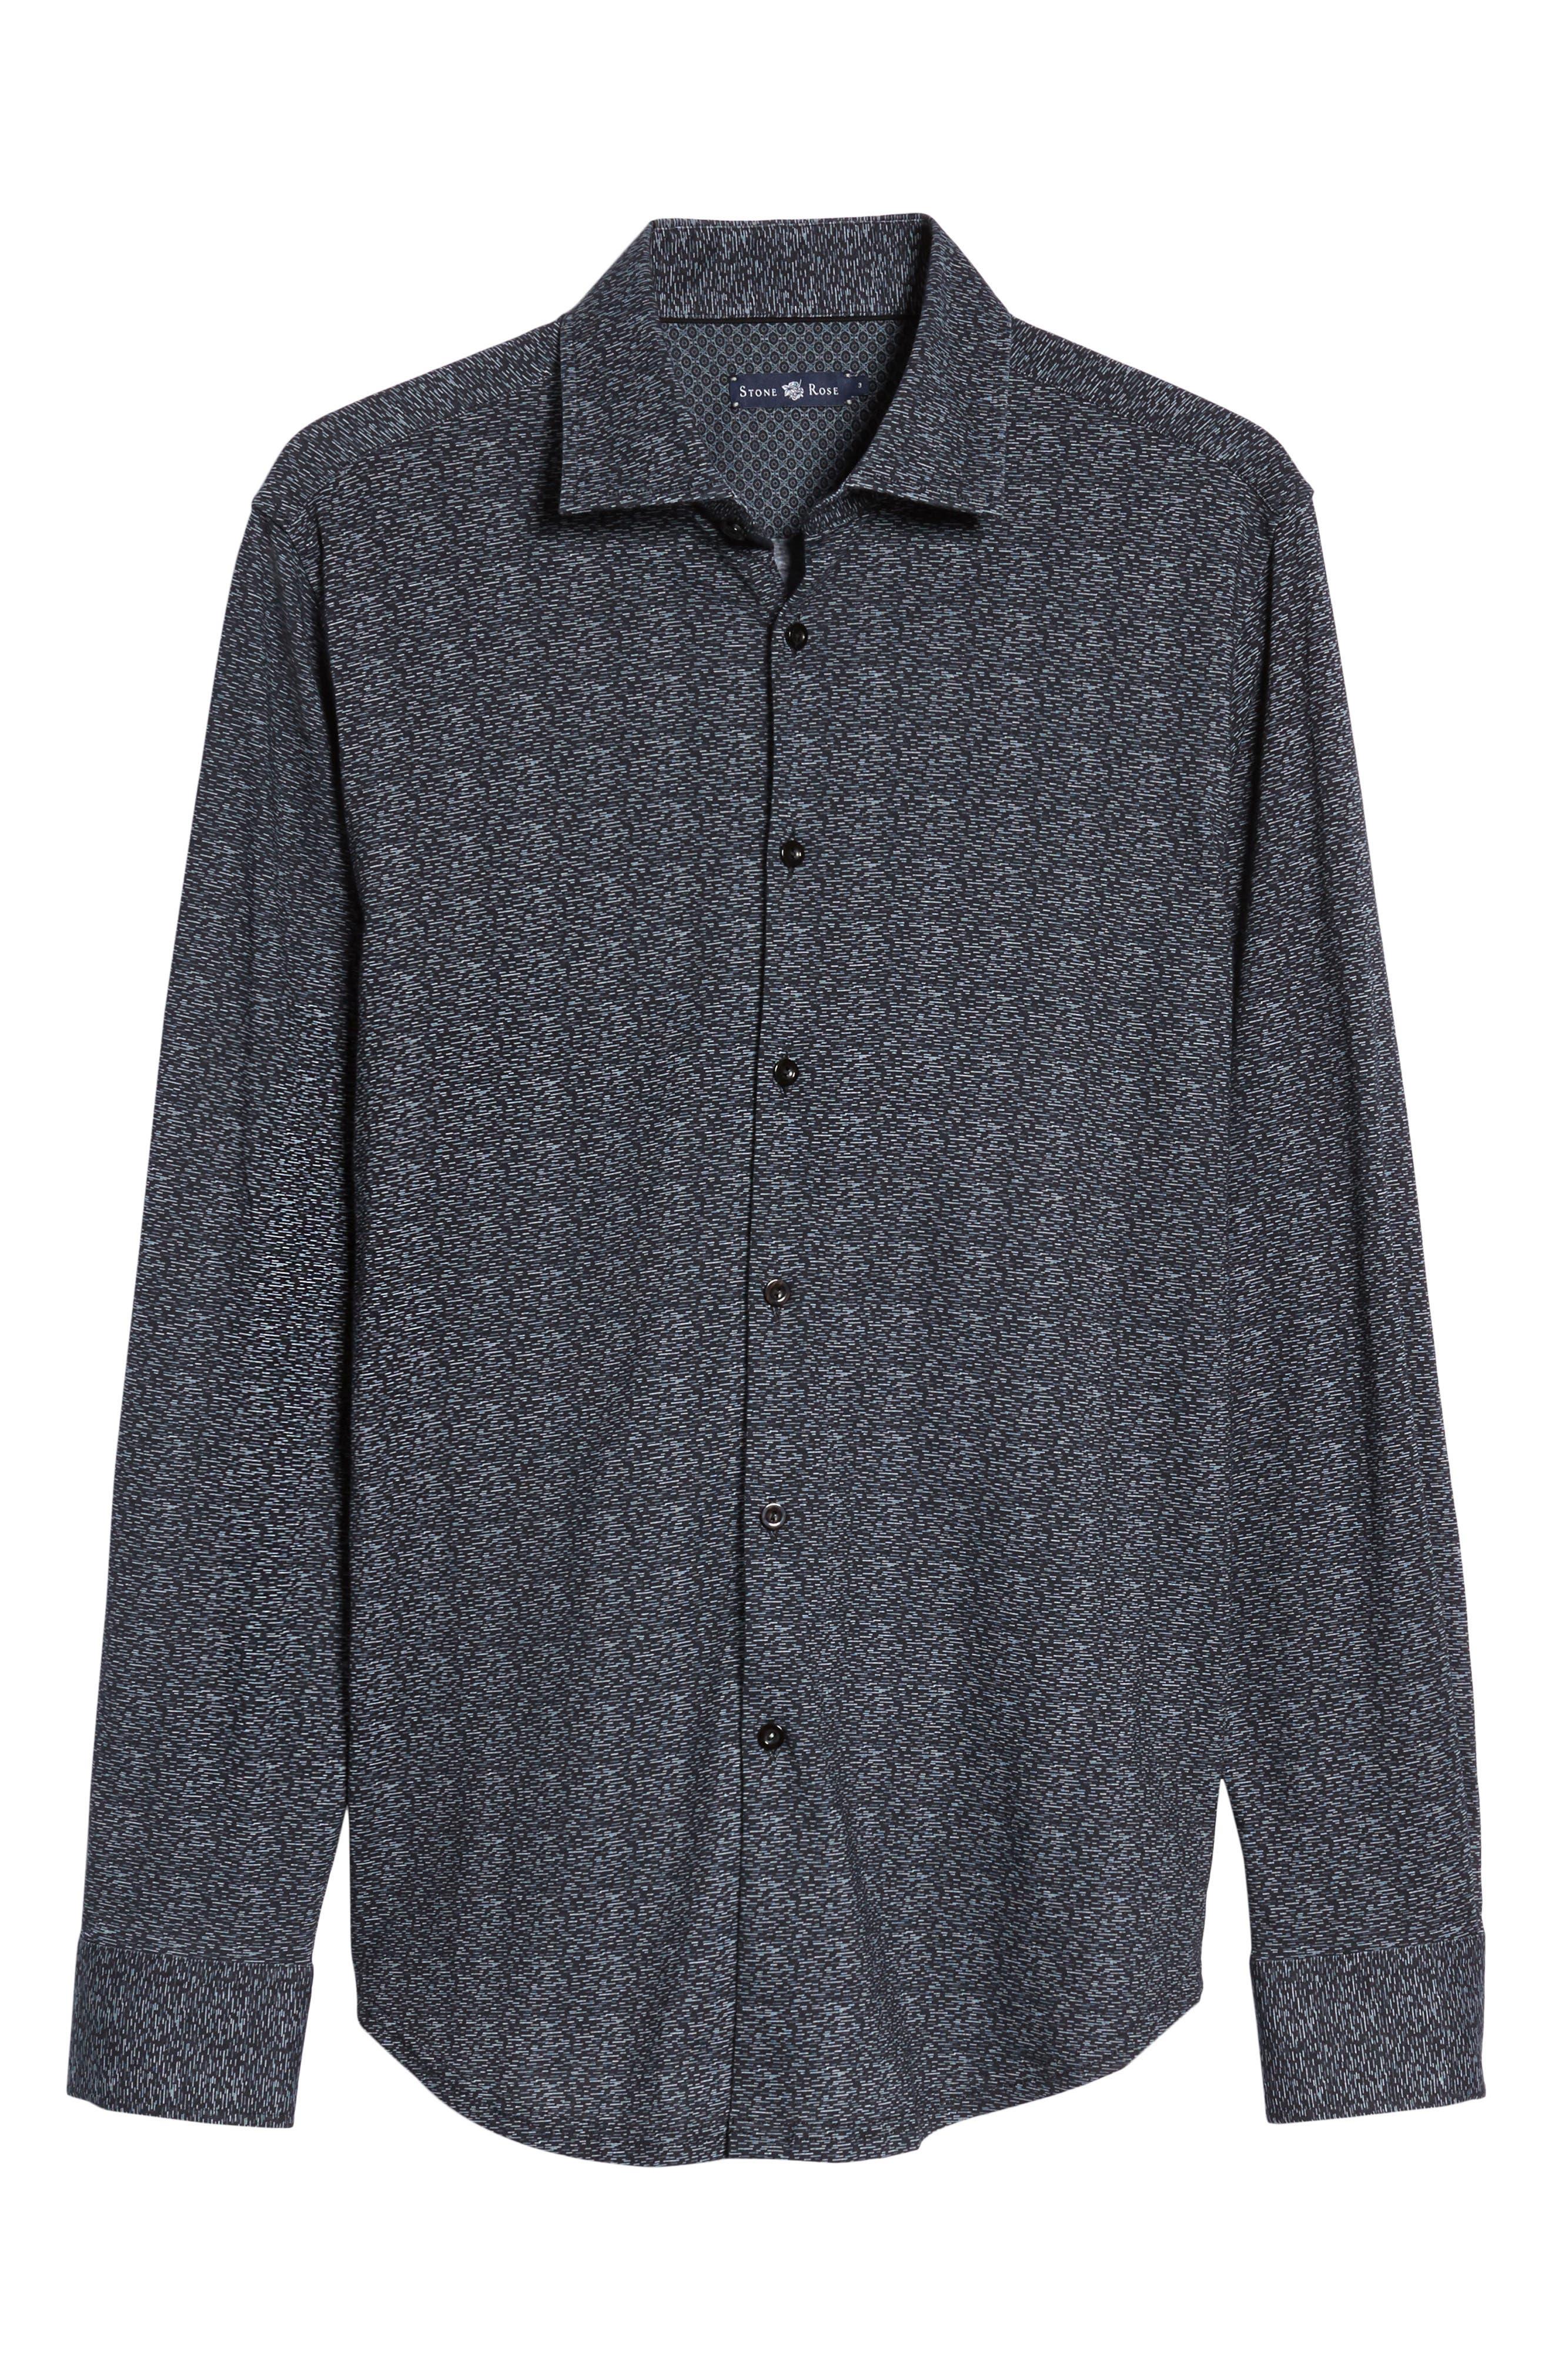 Mélange Knit Sport Shirt,                             Alternate thumbnail 6, color,                             Black